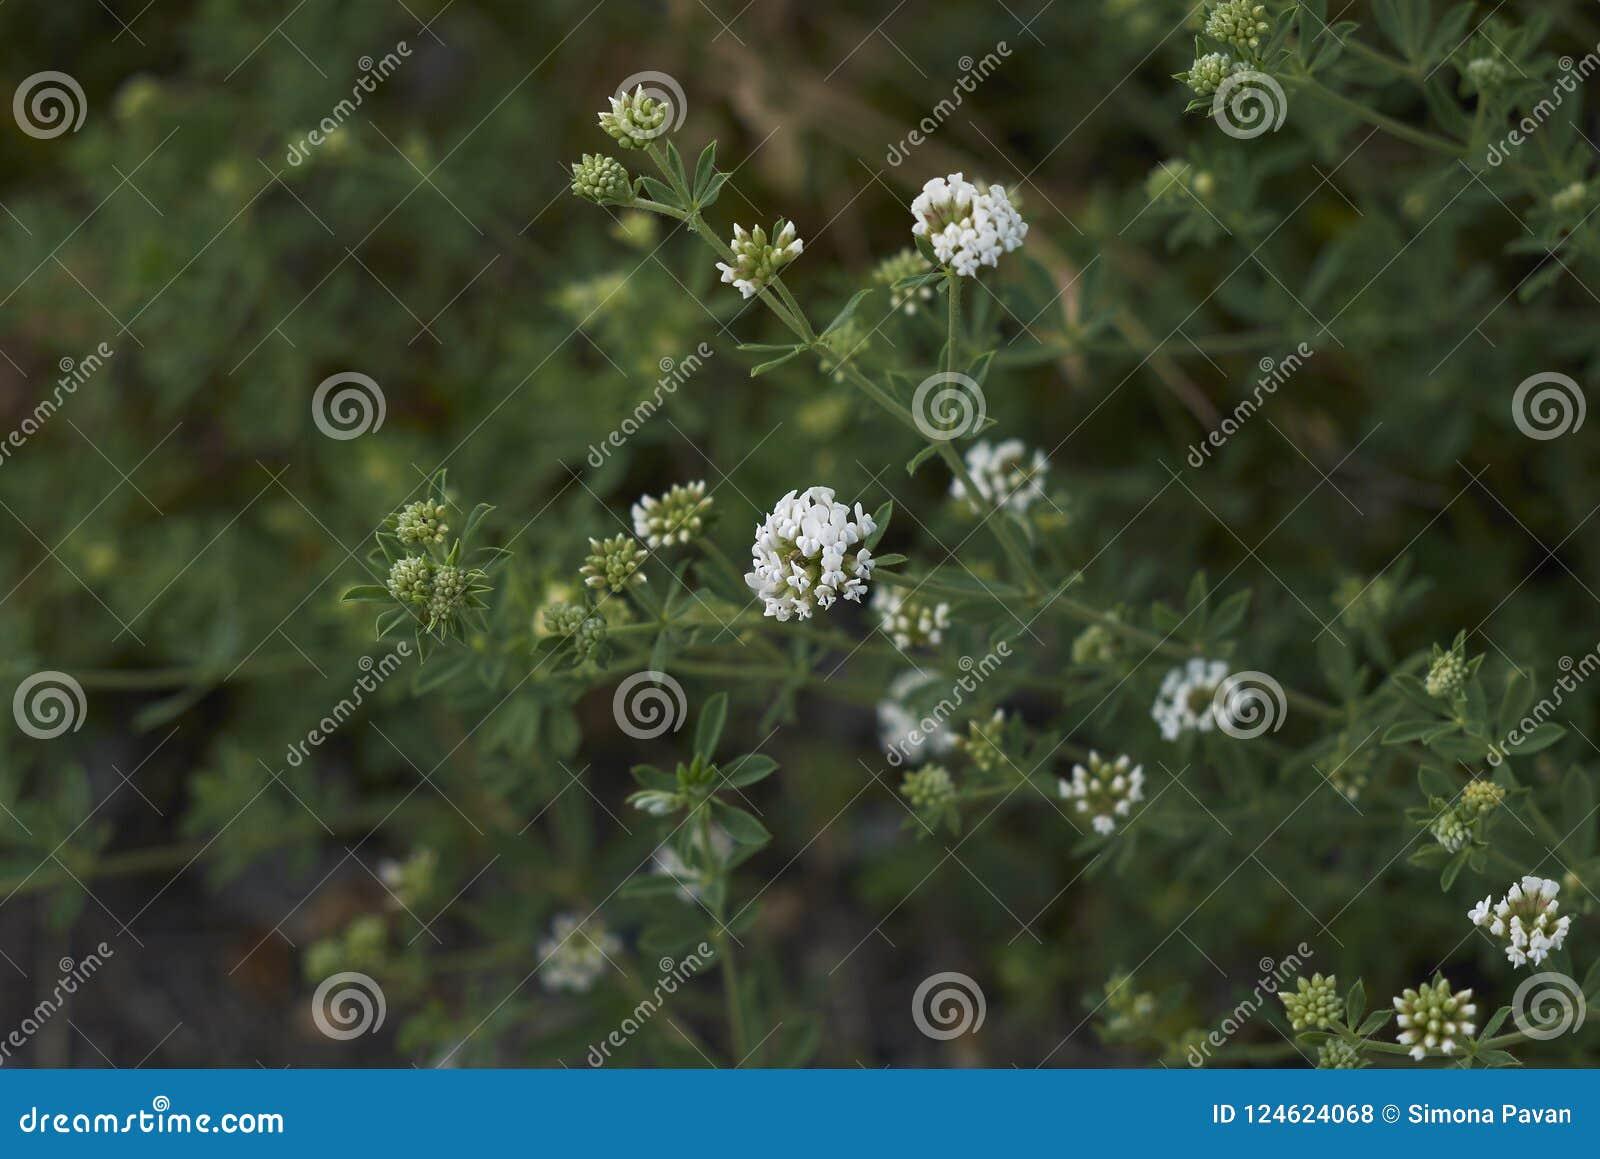 White tiny flowers of dorycnium pentaphyllum plant stock photo download white tiny flowers of dorycnium pentaphyllum plant stock photo image of perennial fabaceae mightylinksfo